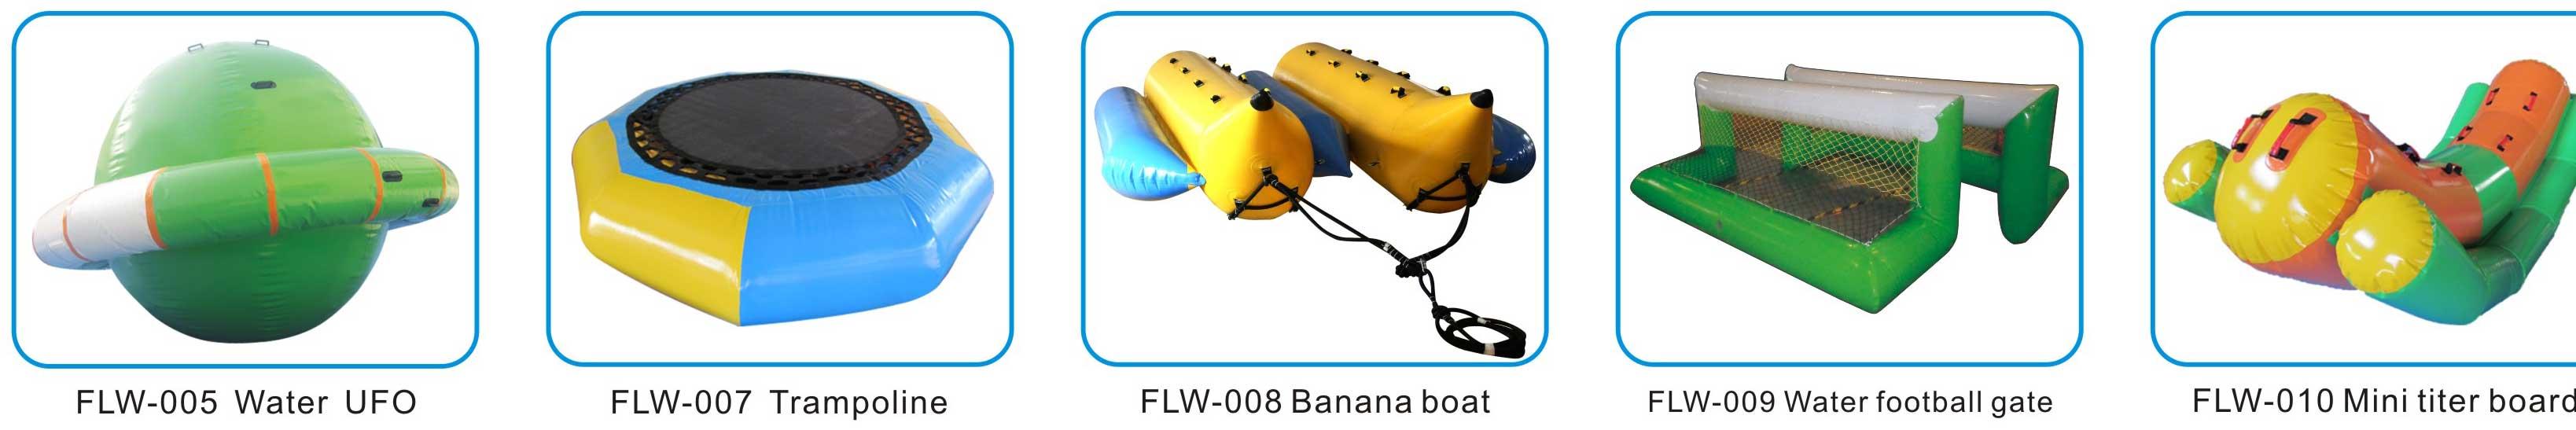 water ufo,trampoline,banana boat,water football gate,mini titer board